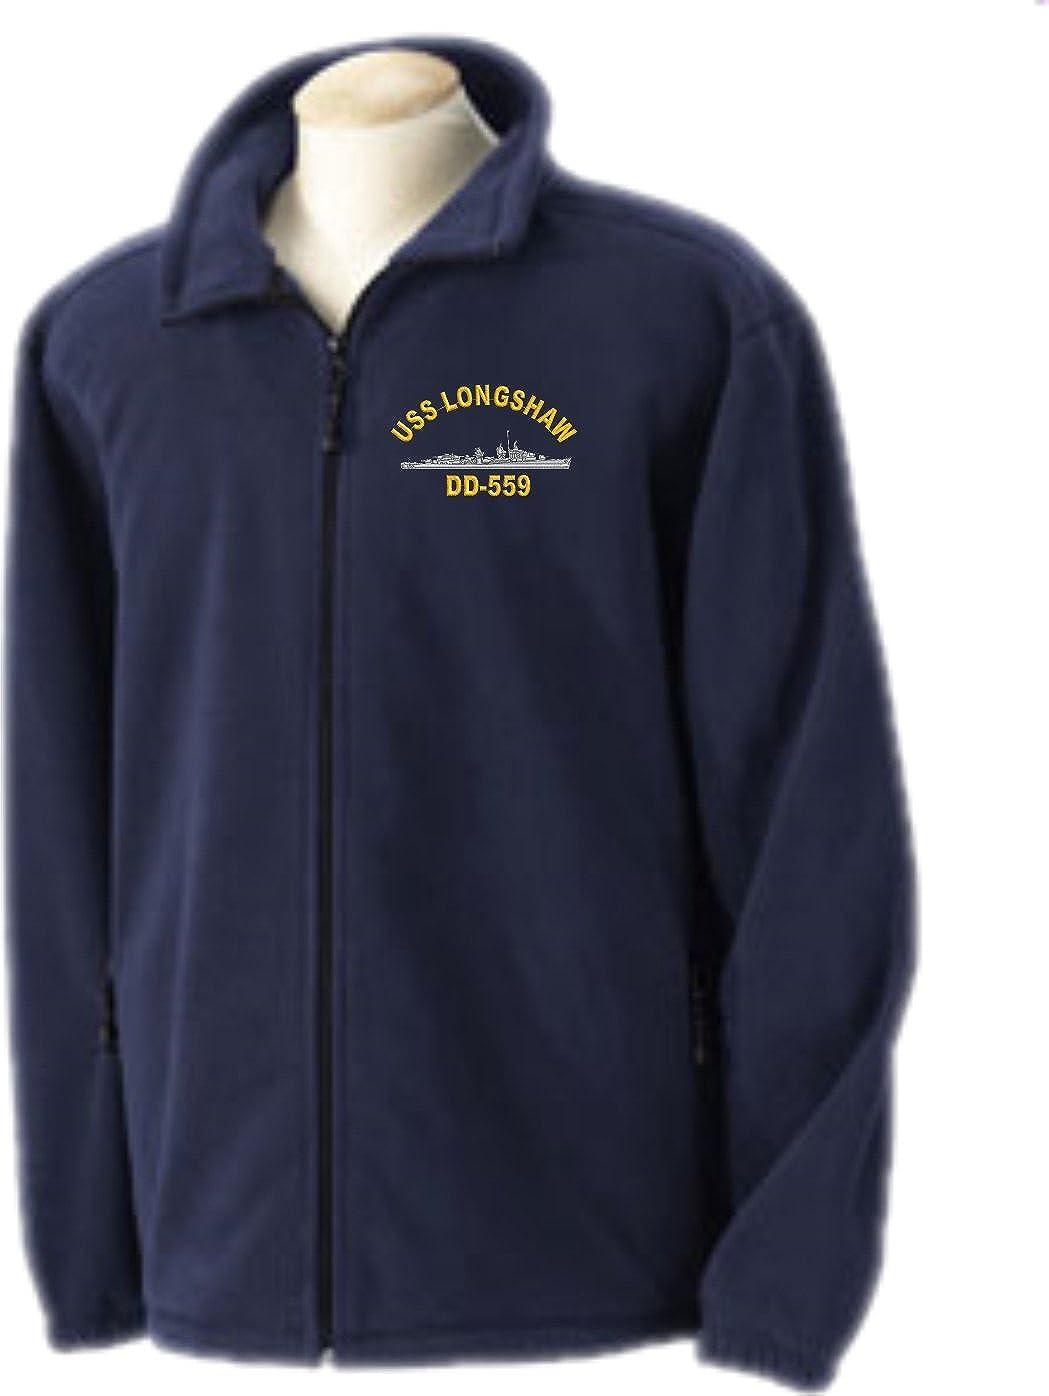 Custom Military Apparel USS LONGSHAW DD-559 Embroidered Fleece Jacket Sizes SMALL-4X